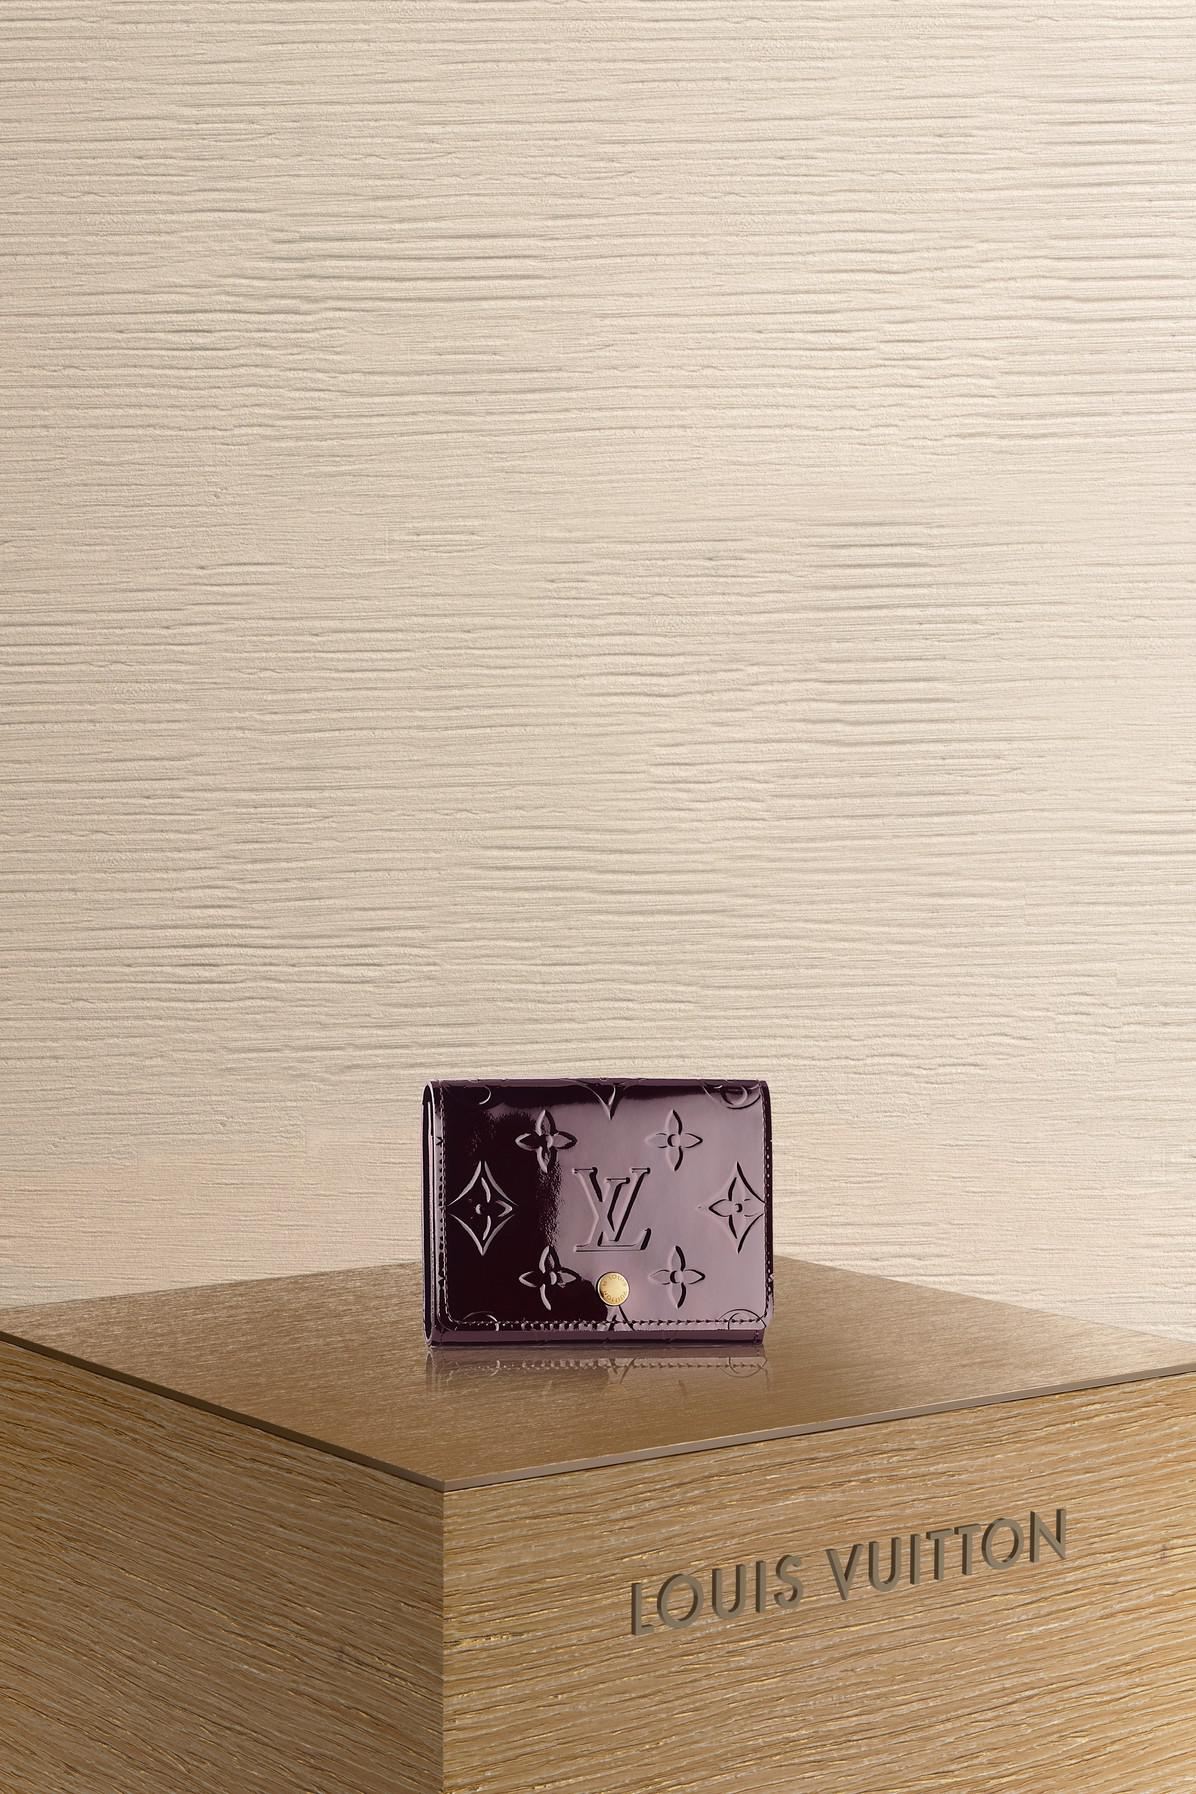 Louis vuitton business card holder lyst louis vuitton womens business card holder colourmoves